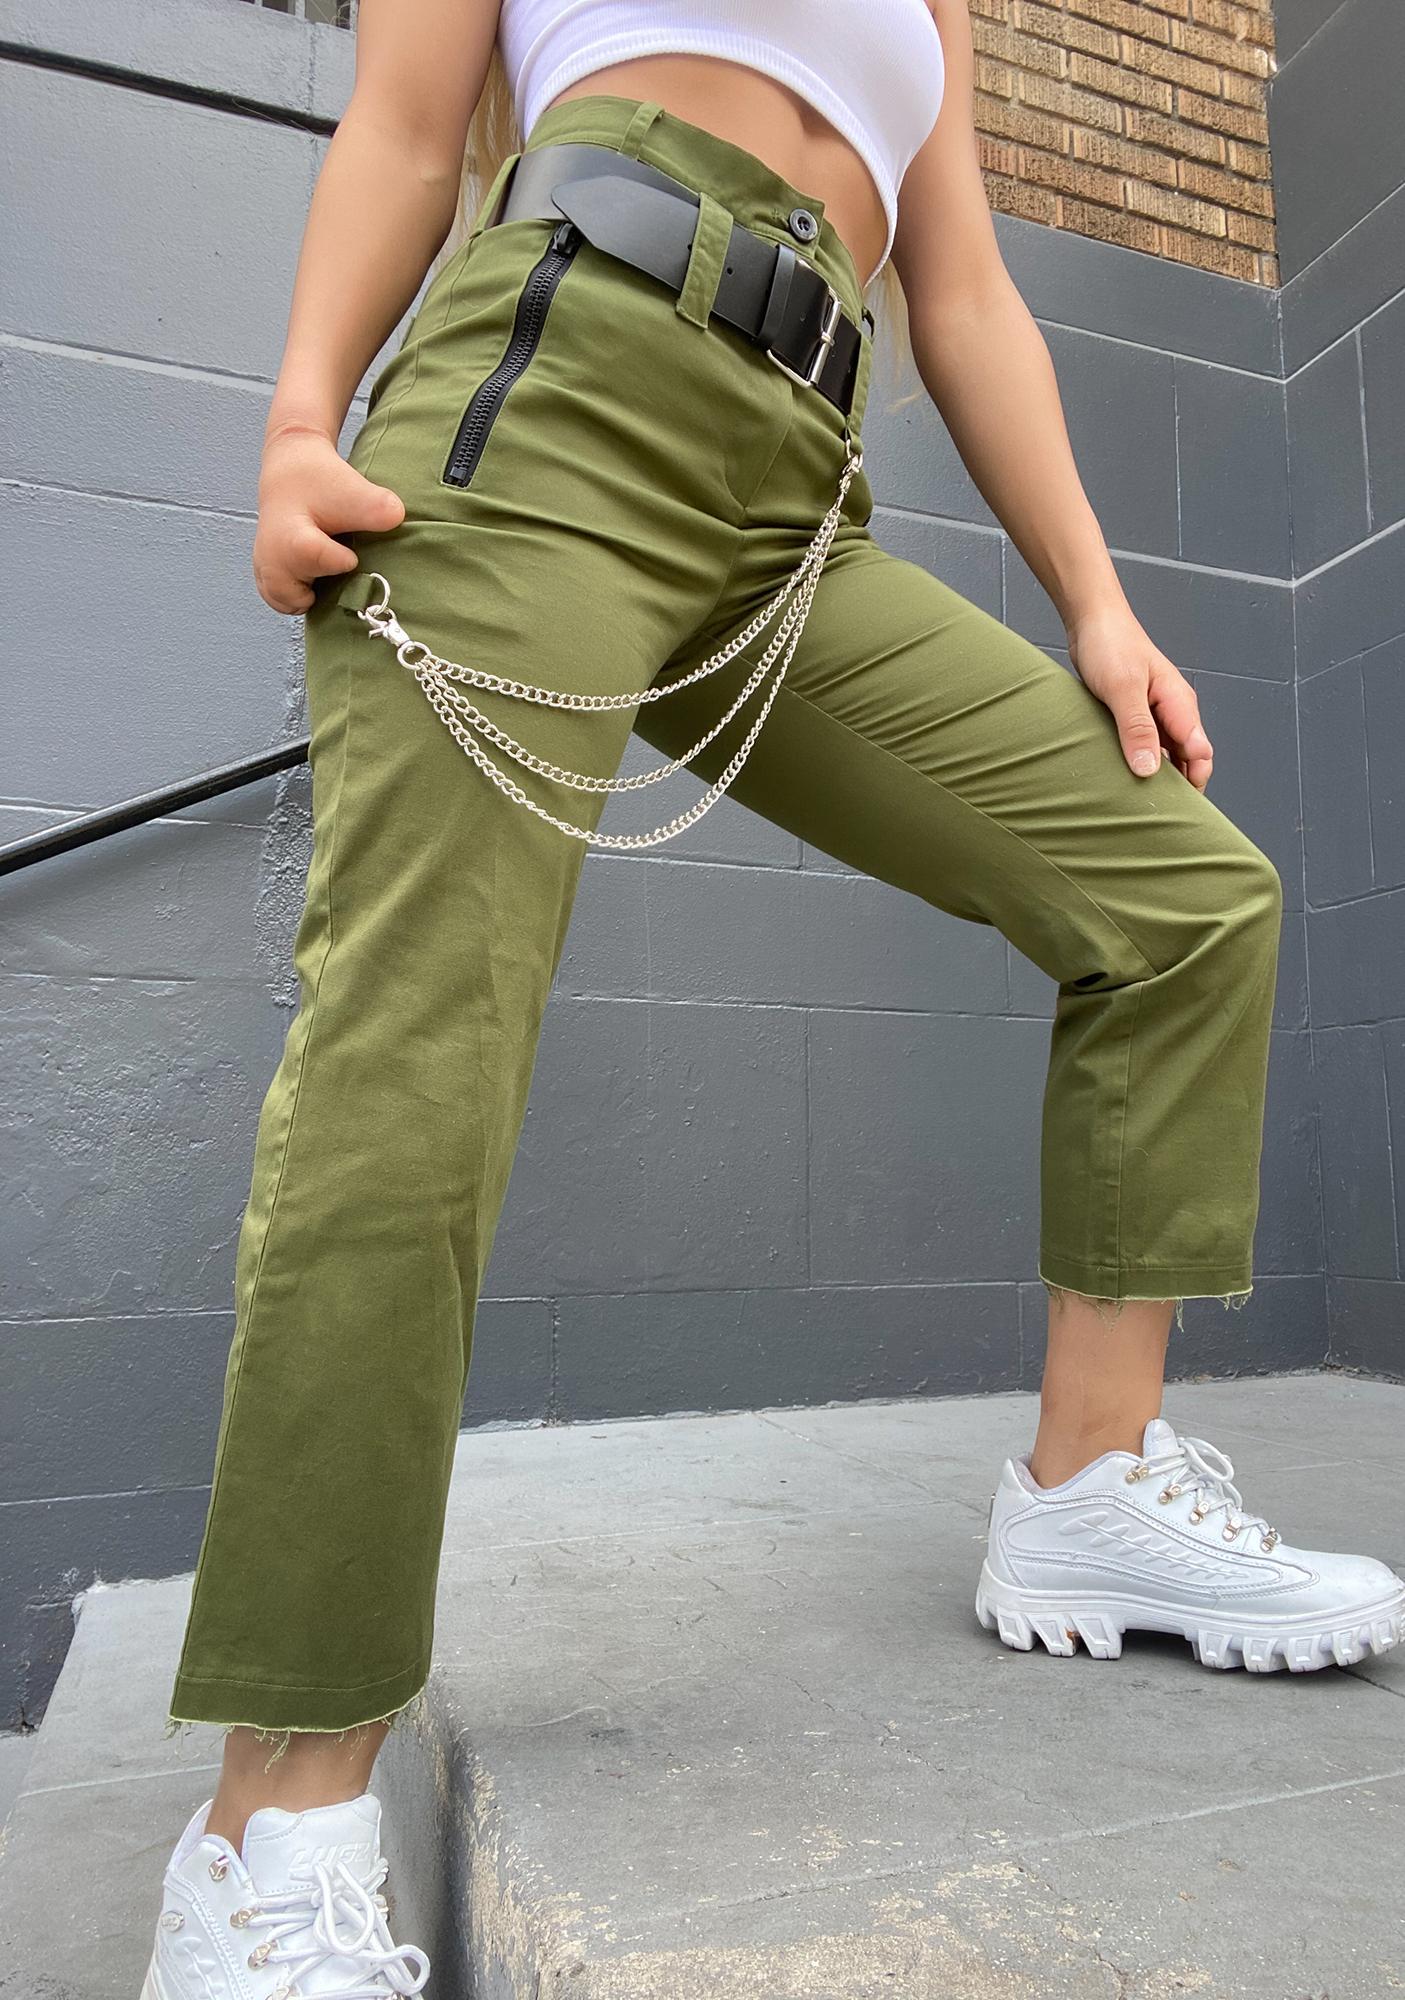 Poster Grl Kush Trap Nightz Chain Trousers